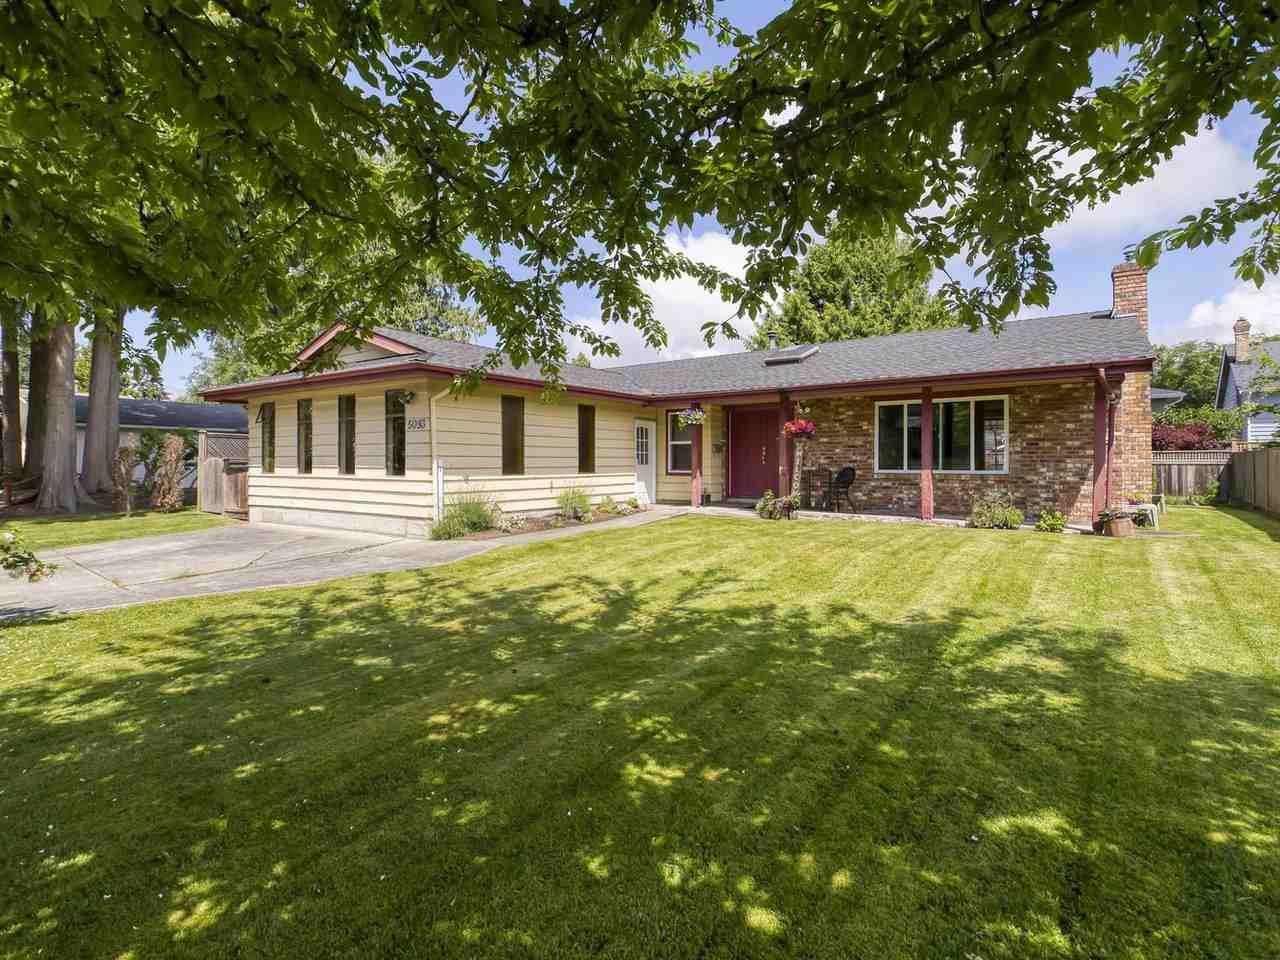 Main Photo: 5093 2 Avenue in Delta: Pebble Hill House for sale (Tsawwassen)  : MLS®# R2462013